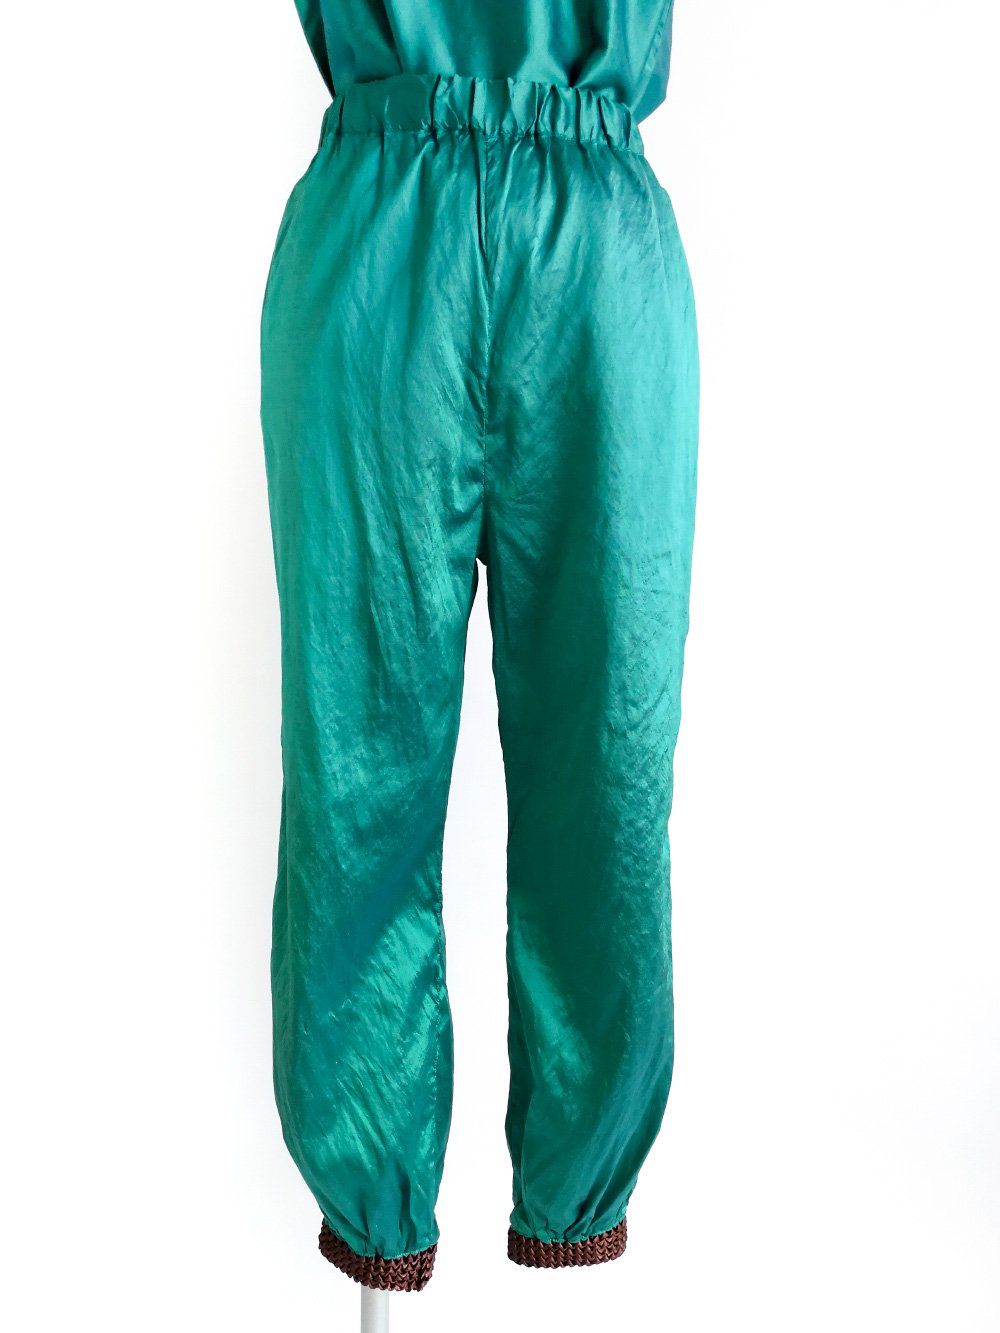 Balloon Pants / original blue